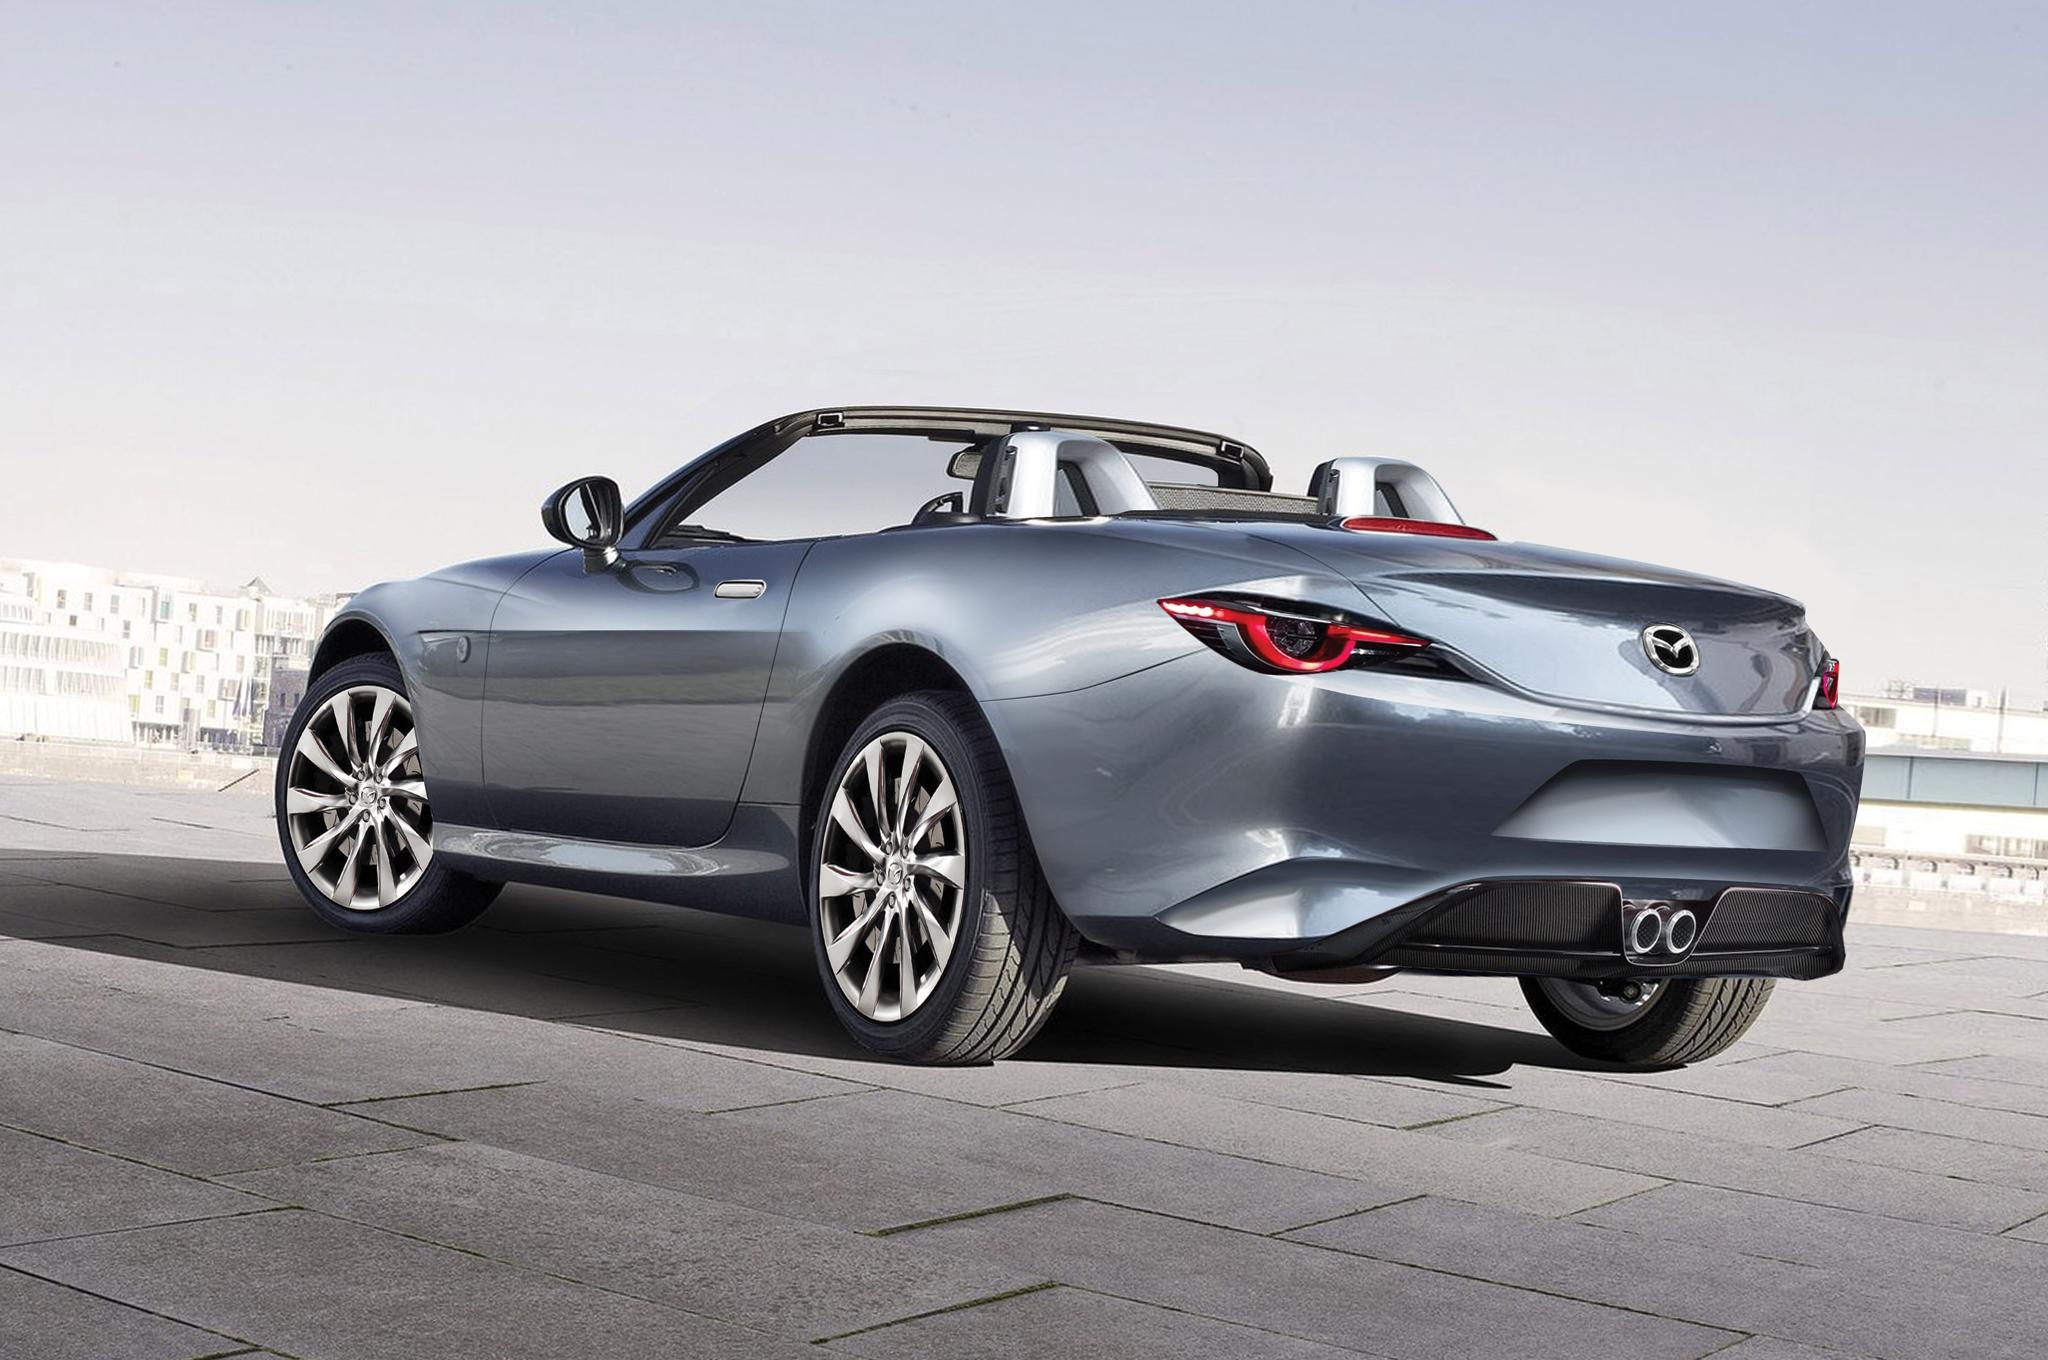 2016 Mazda Mx 5 Miata Image 6